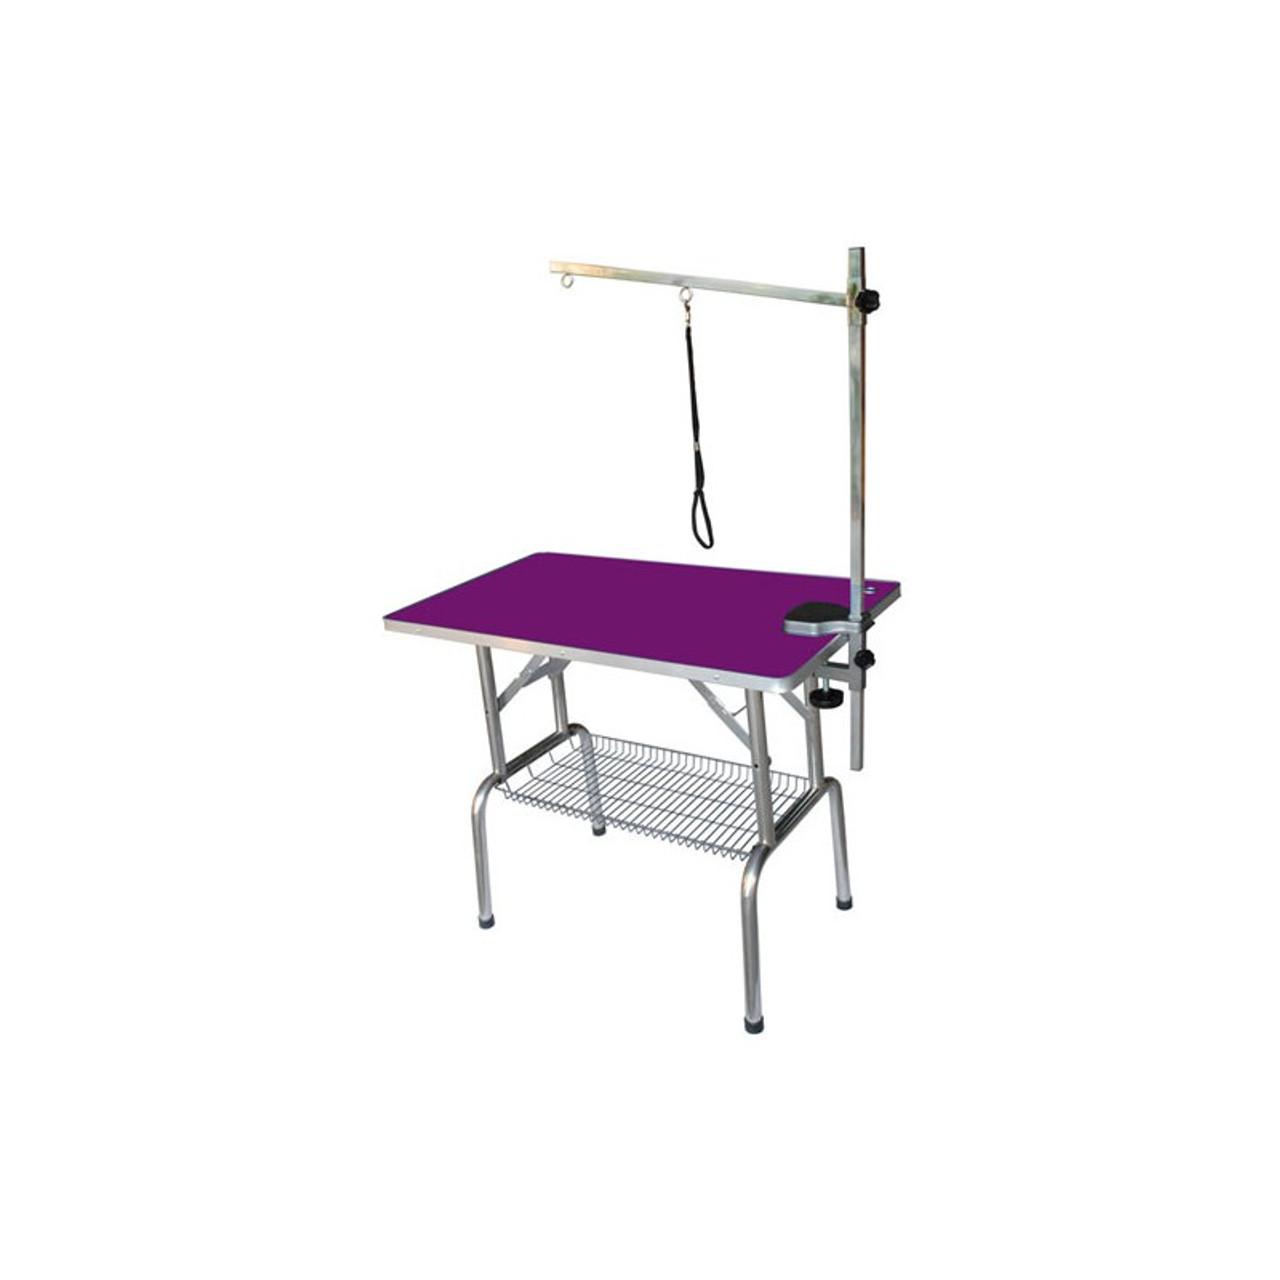 Phoenix Universal Portable Grooming Table